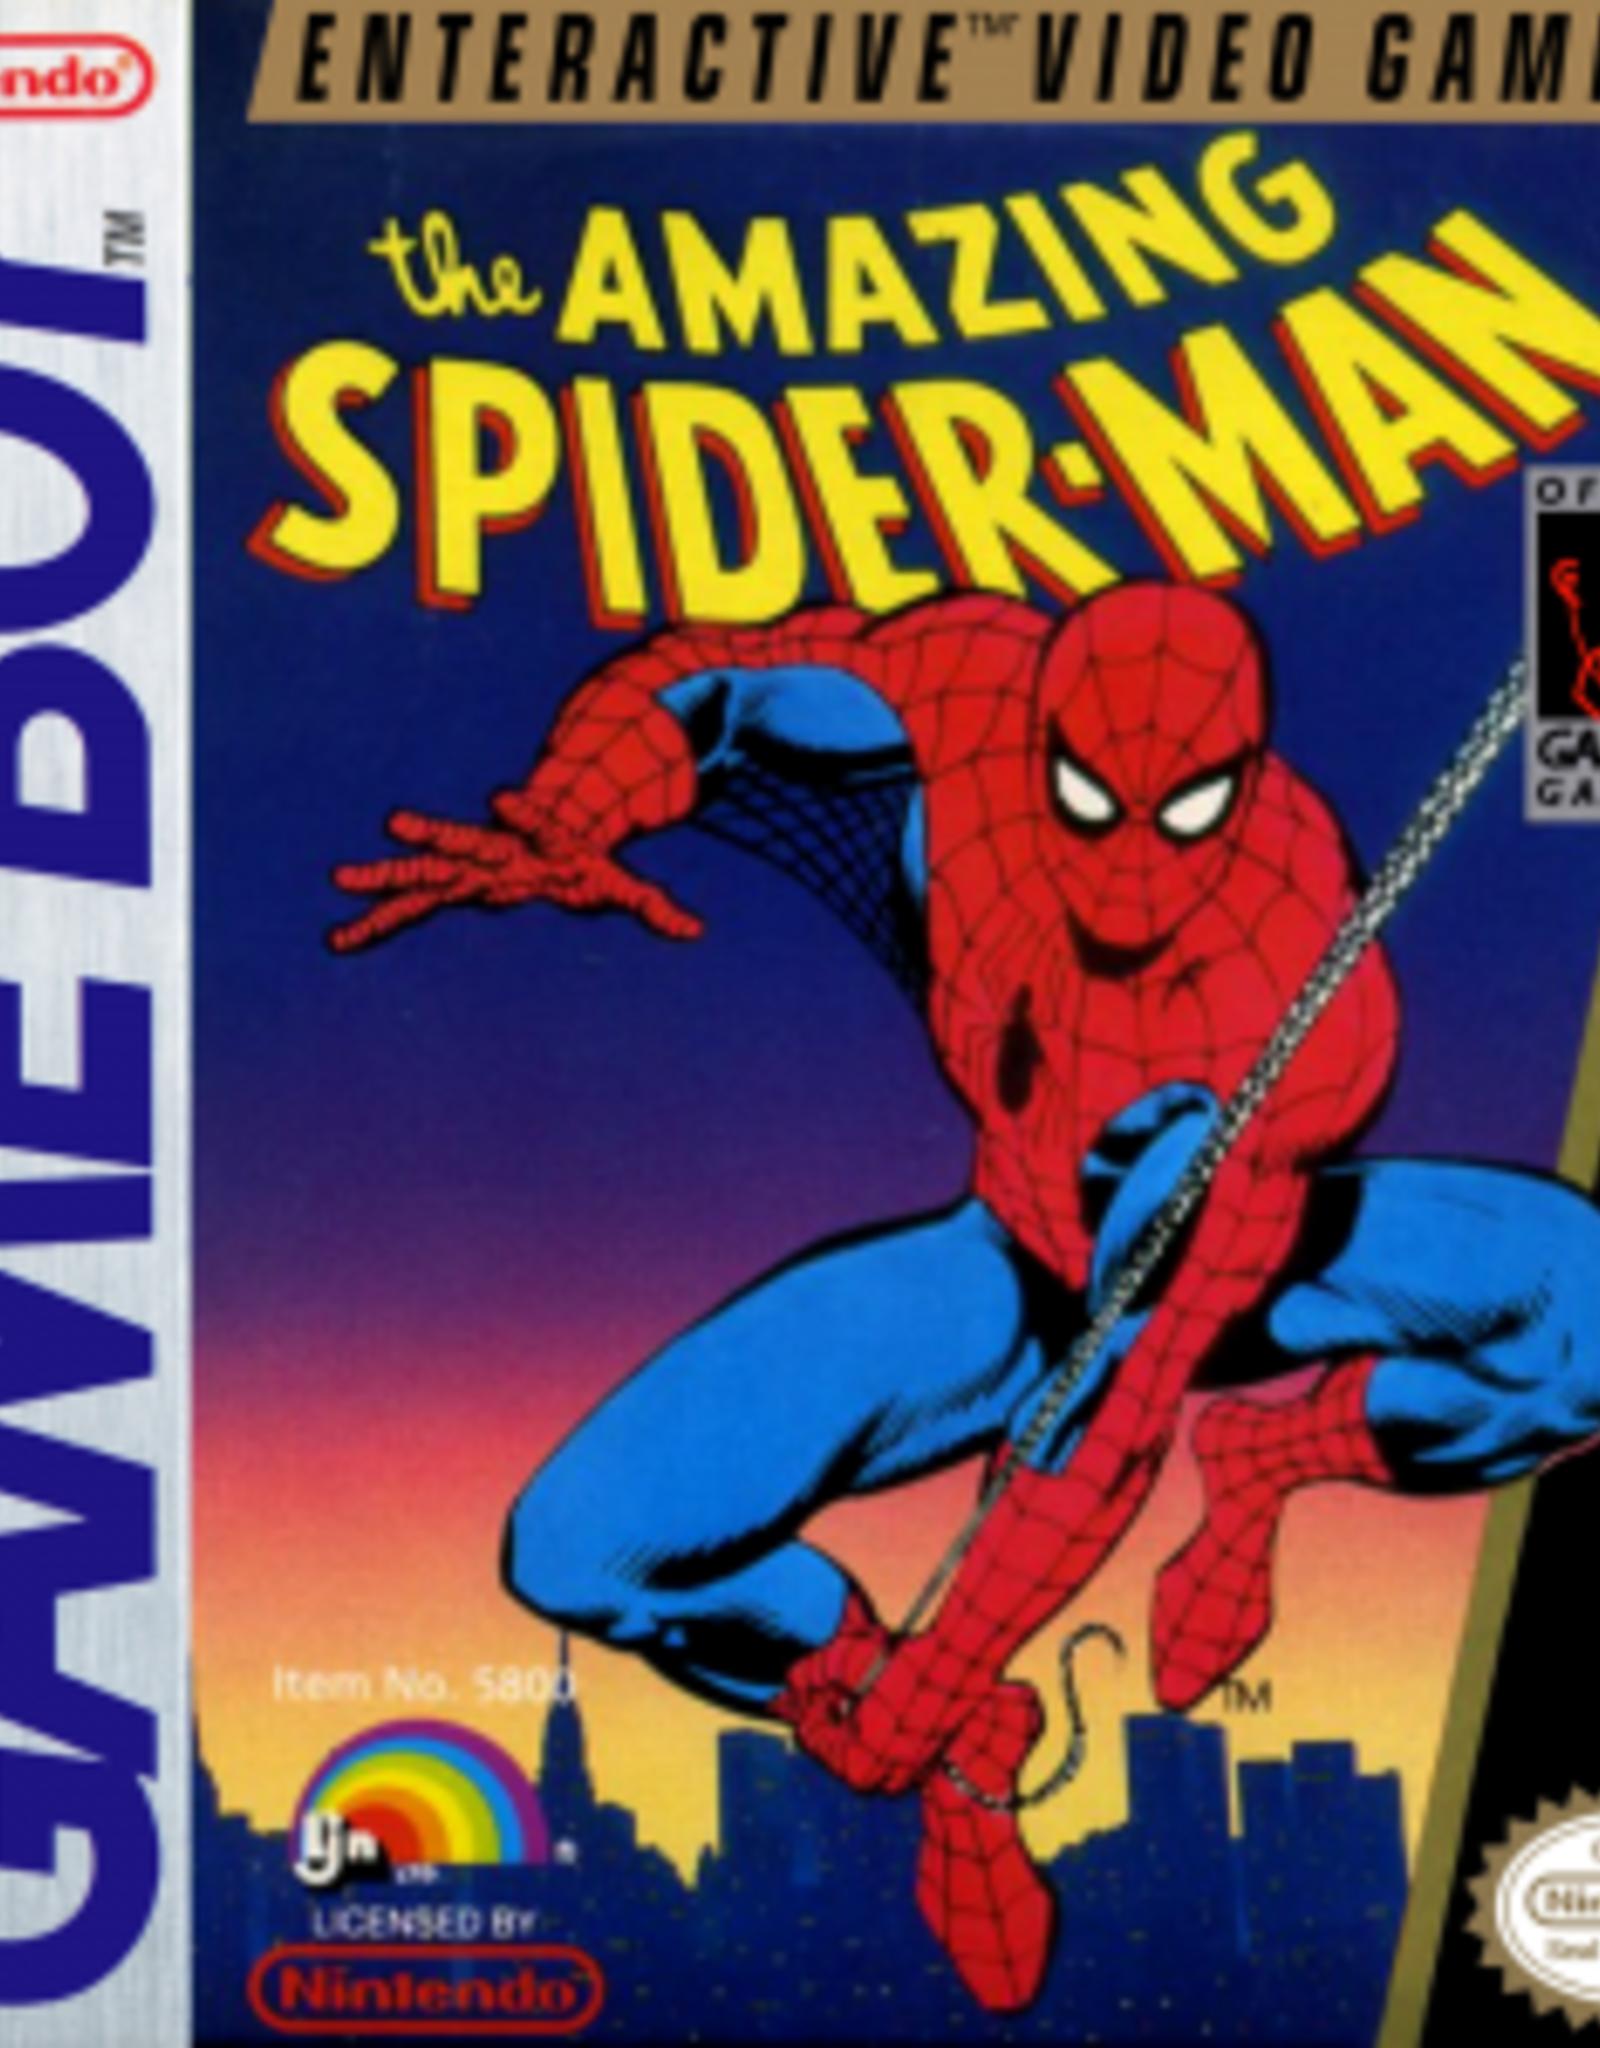 GameBoy Amazing Spider-Man (Cart Only)